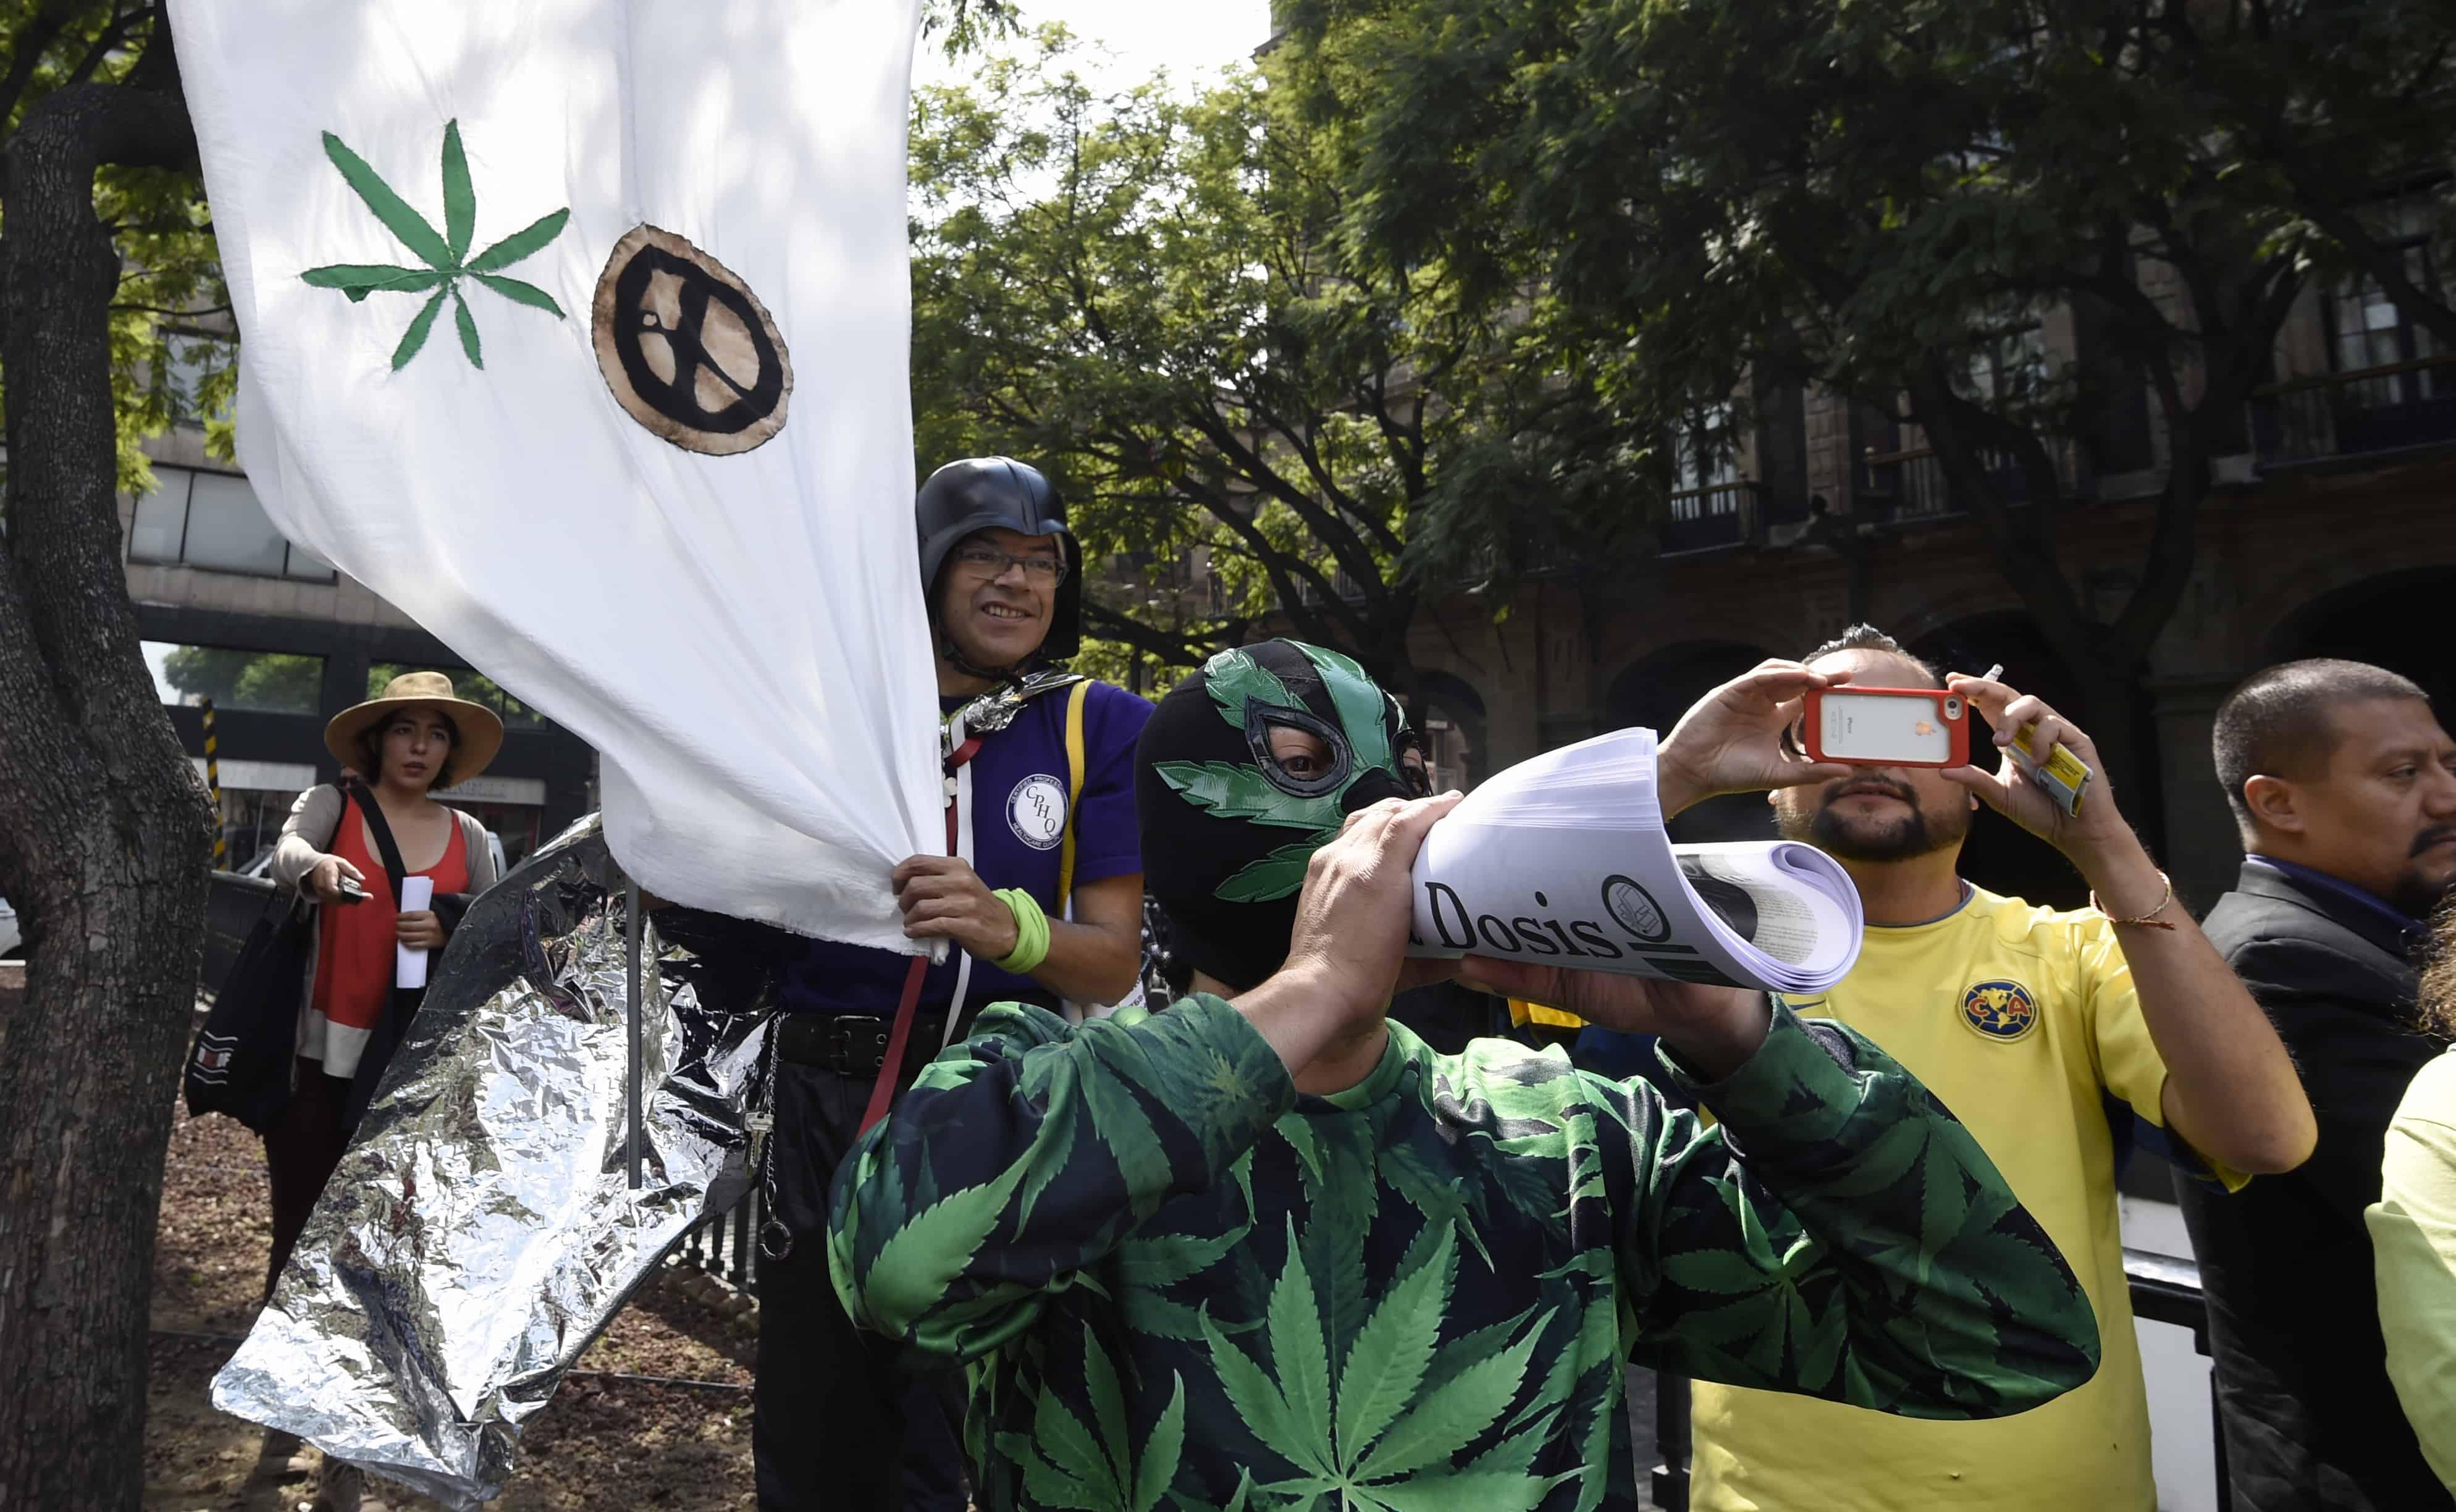 pot rally in Mexico City